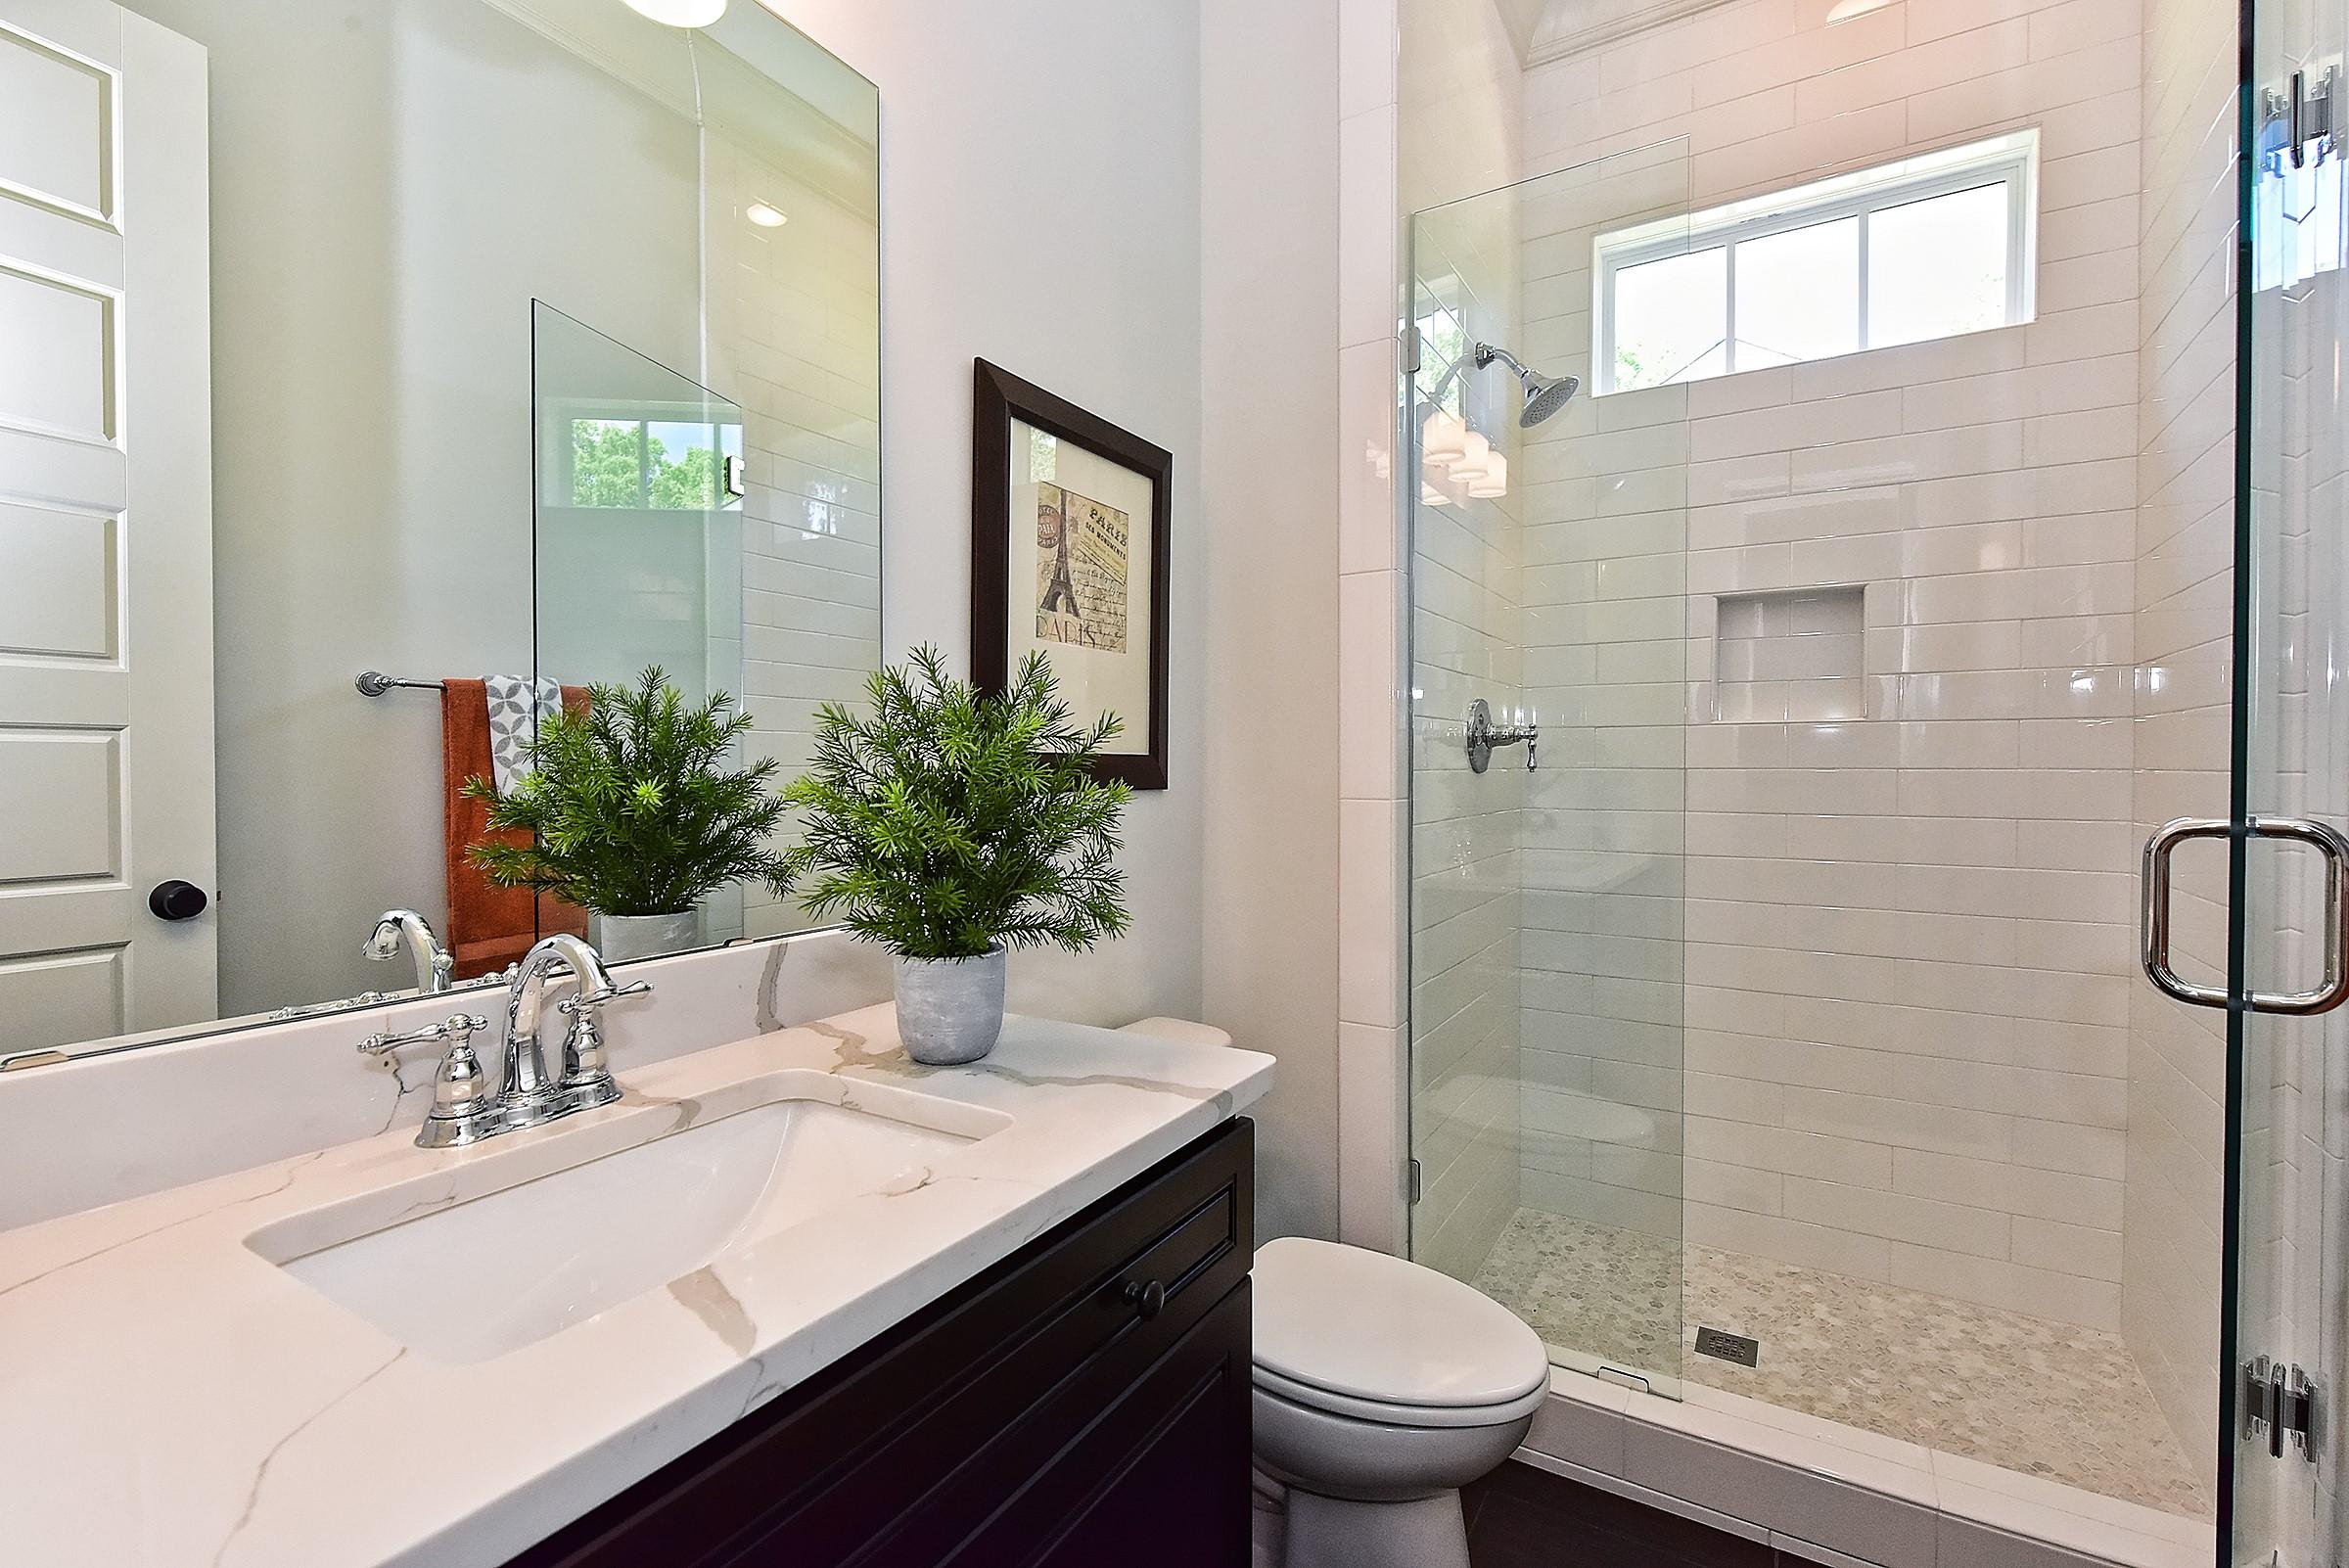 017_Bathroom.jpg